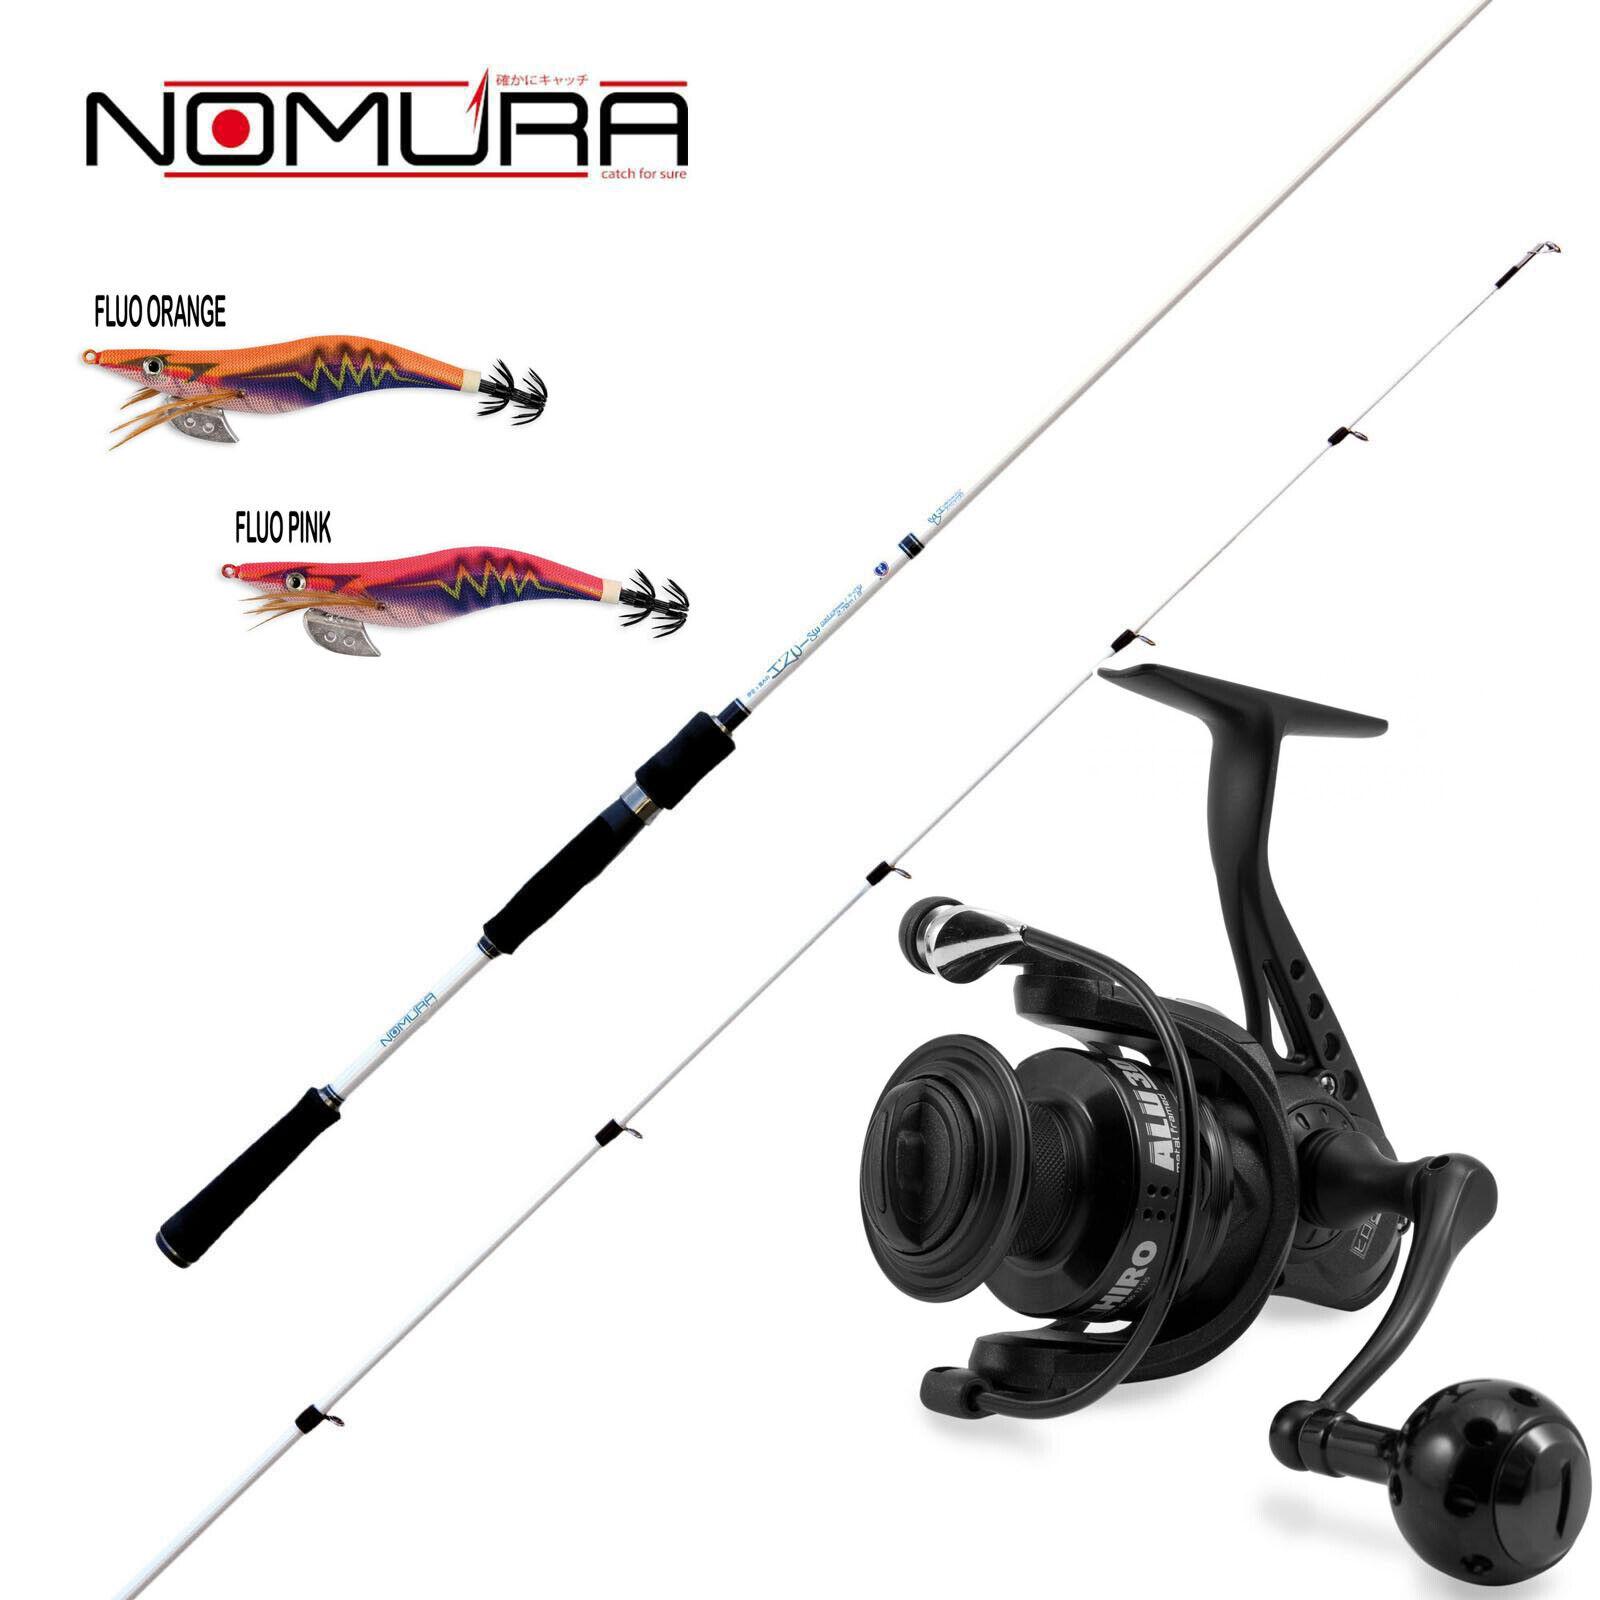 KP3120 Kit pesca Egi Canna Nomura Izu SW 11-21 Gr 270 Mulinello totanare    CSP